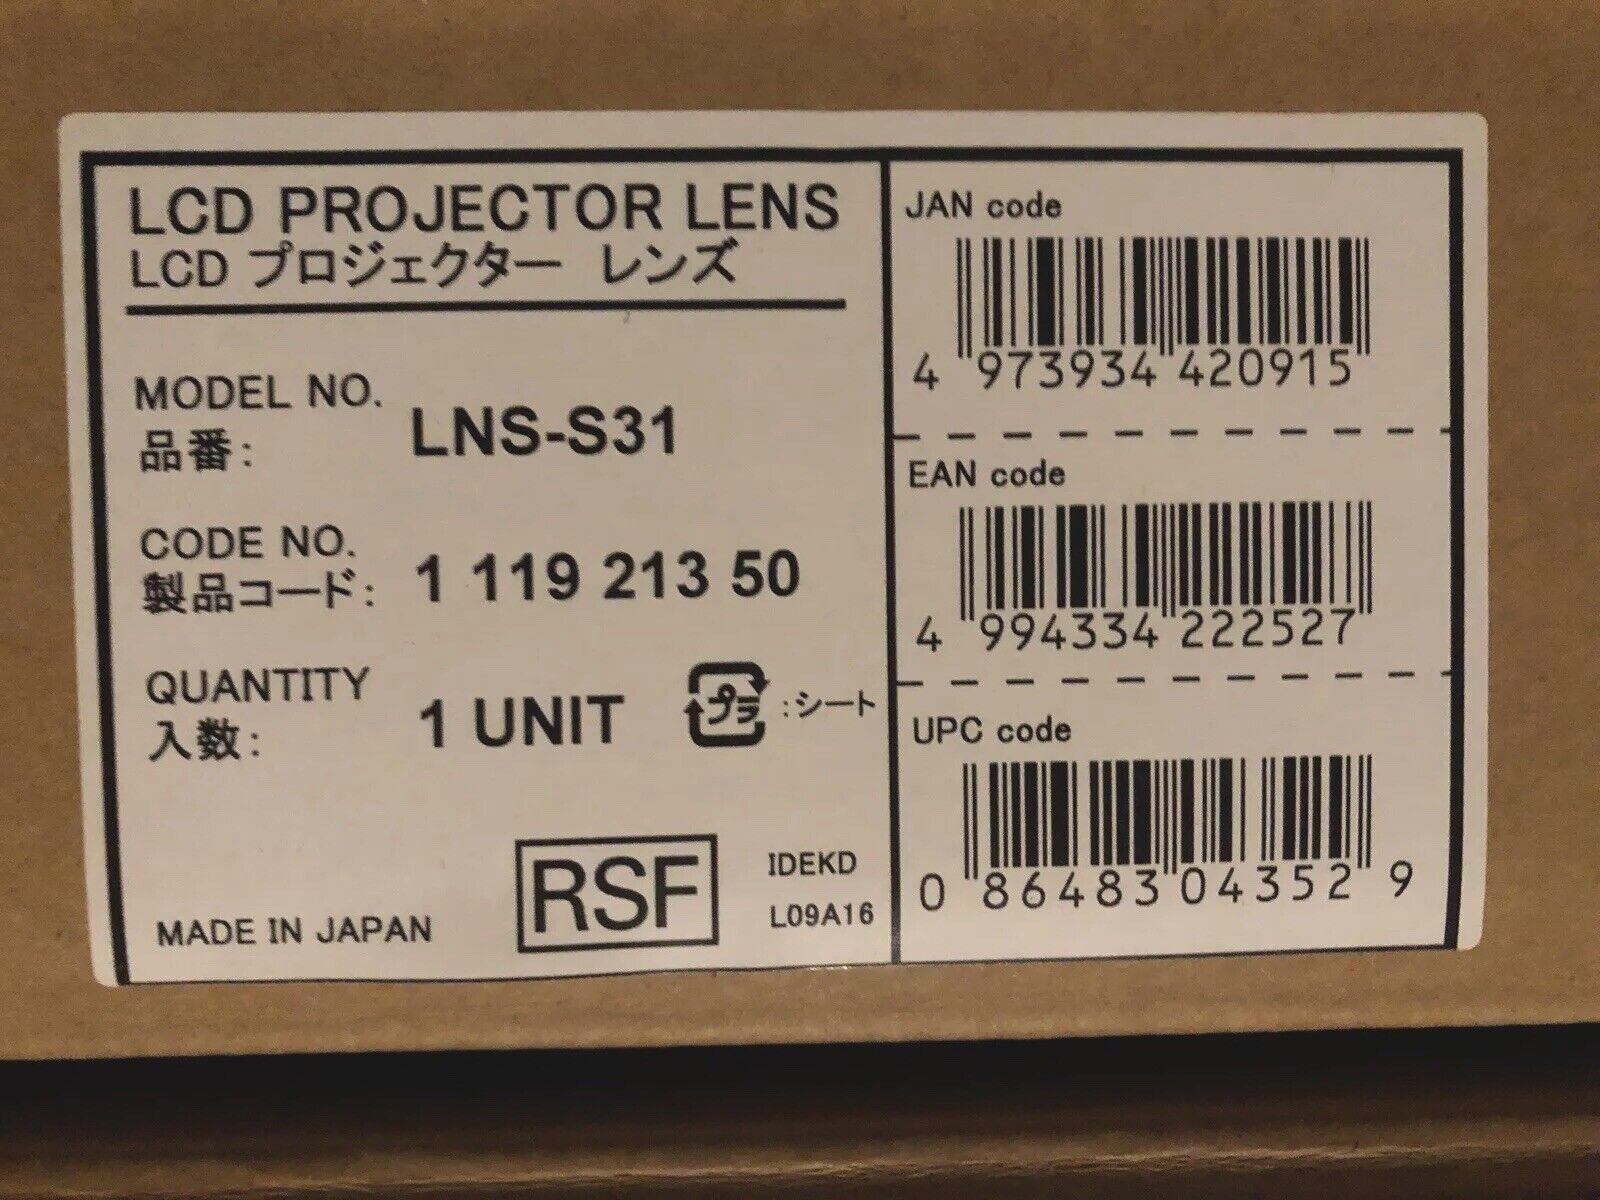 Brand-new Sanyo LNS-S31 Short Zoom Lens In Box BNIB